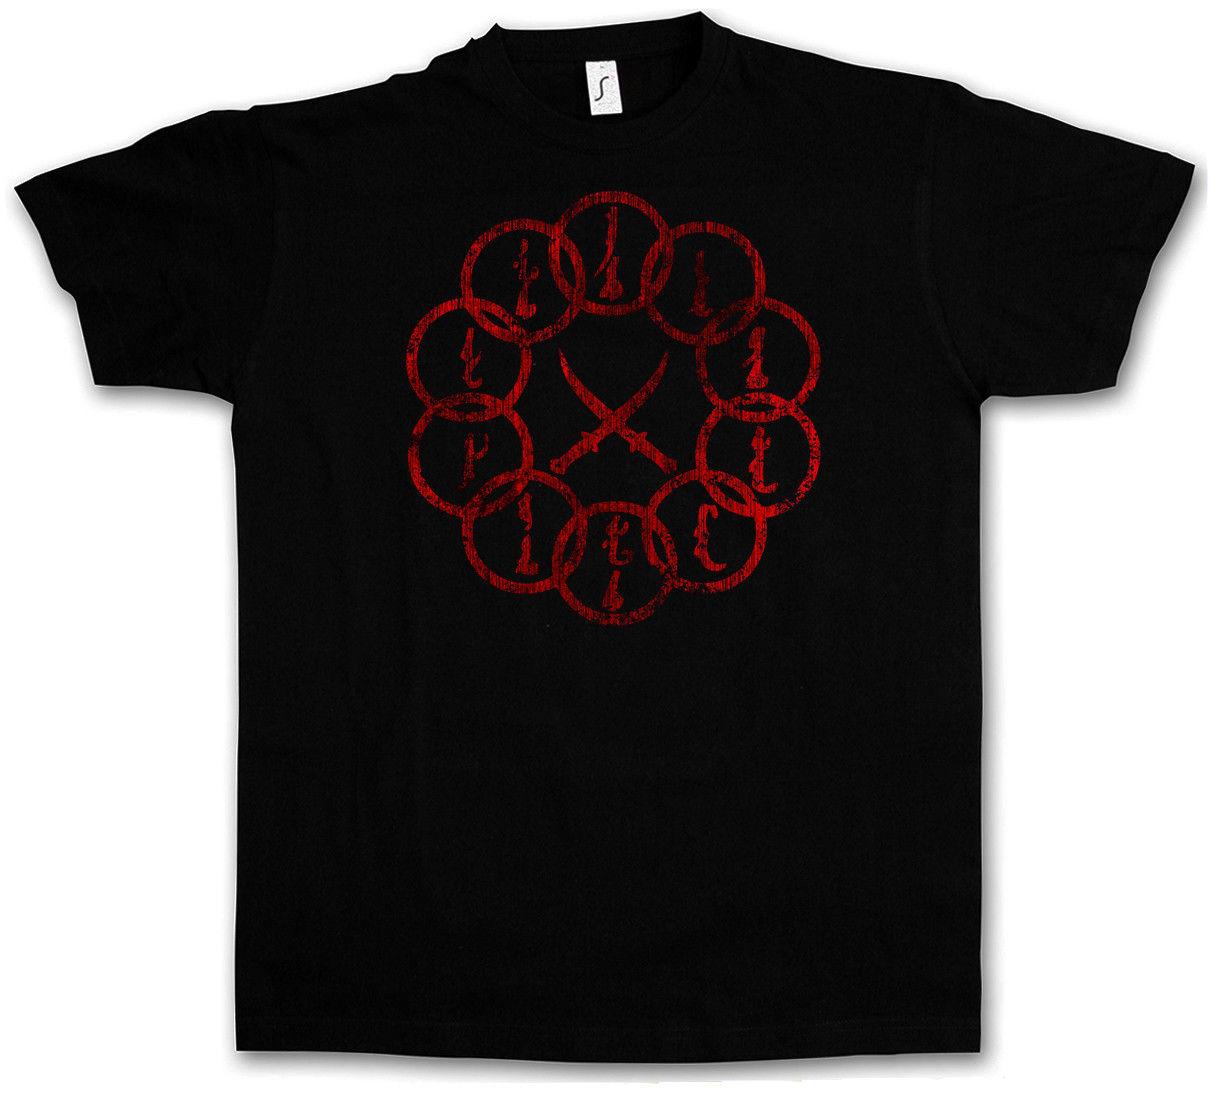 Mandarin Vintage Logo Ii – Iron Man Tony Stark Avengers 3 Shows T Shirt